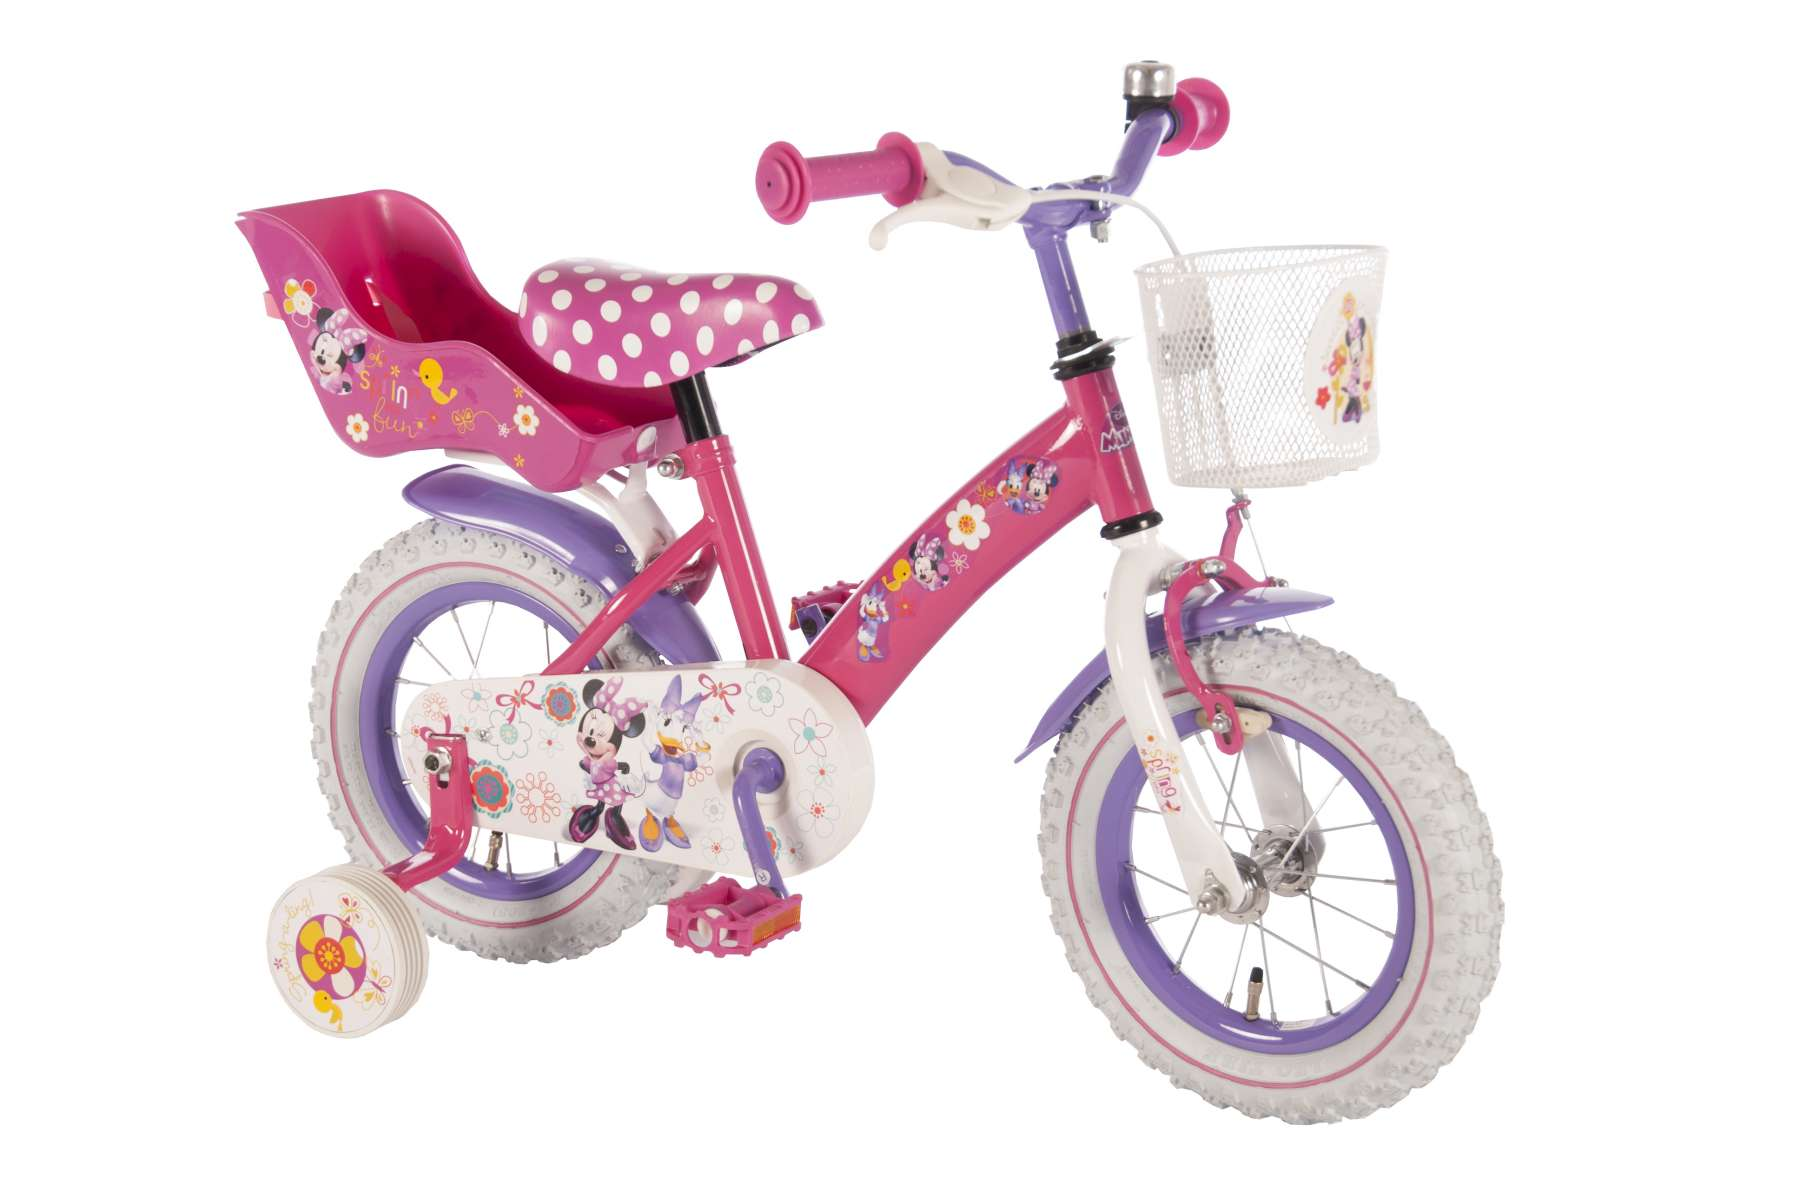 21226 Disney Minnie BowTique 12 inch EAN 8715347(31226)7